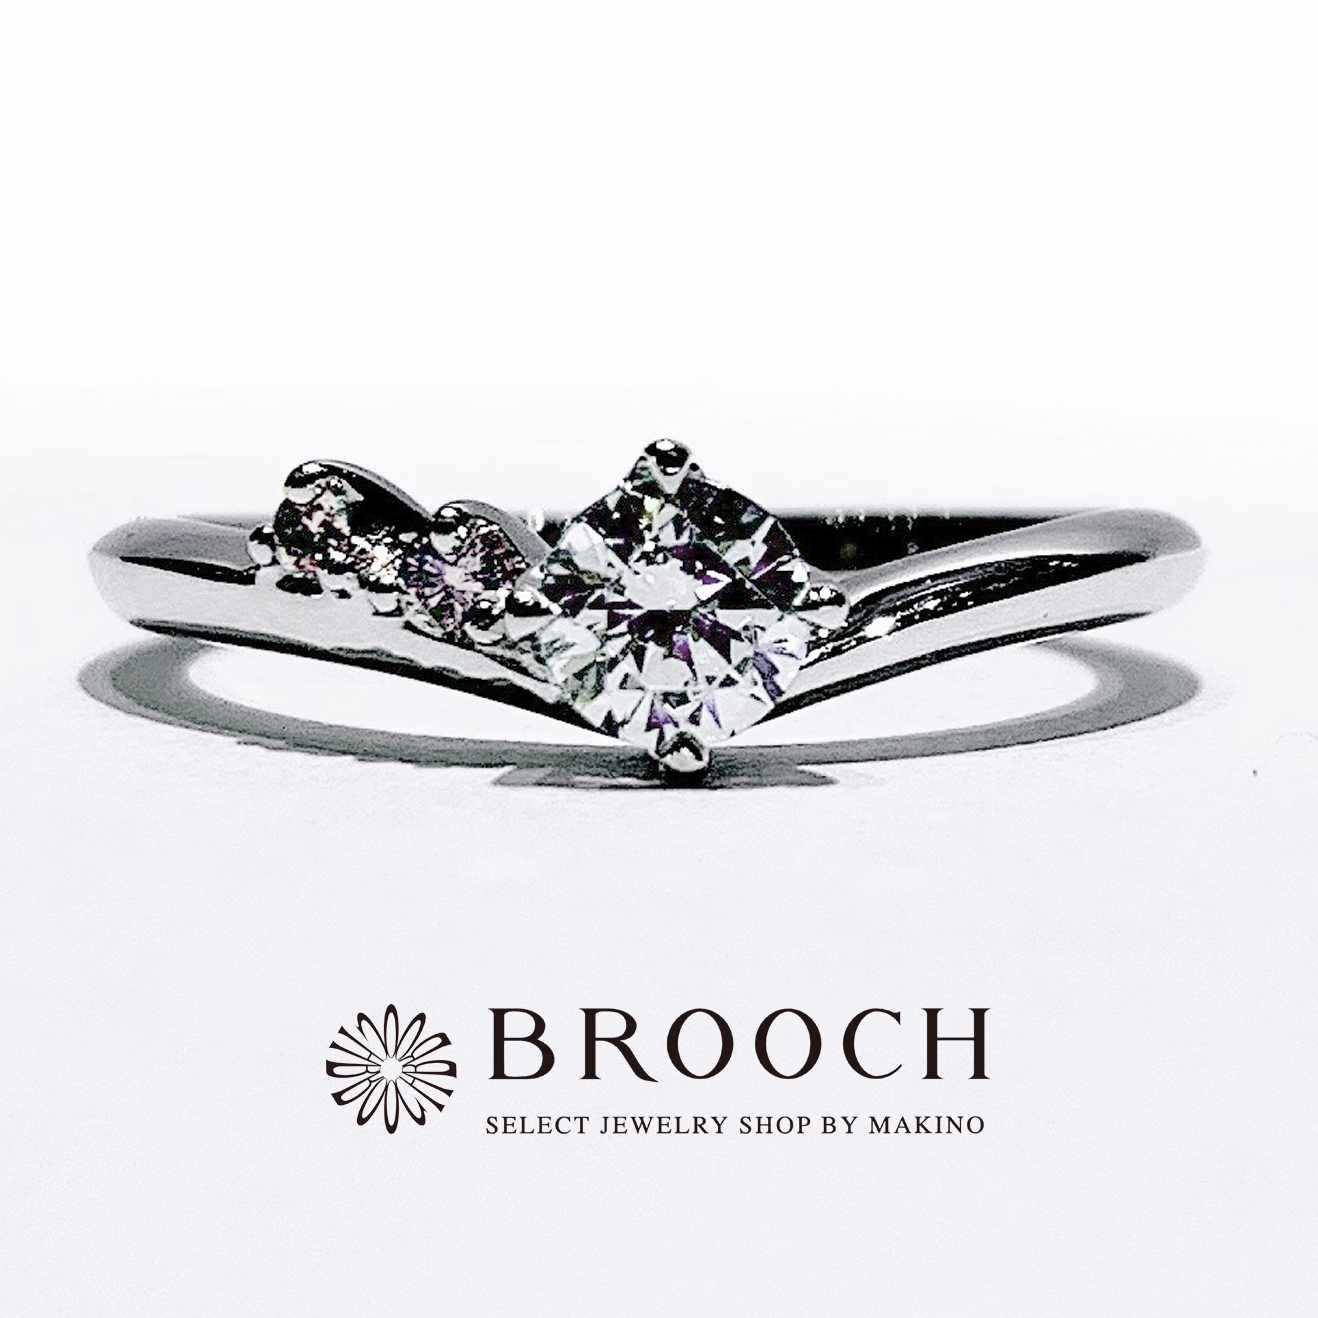 BROOCH 婚約指輪 エンゲージリング 片側メレピンクダイヤV字ライン